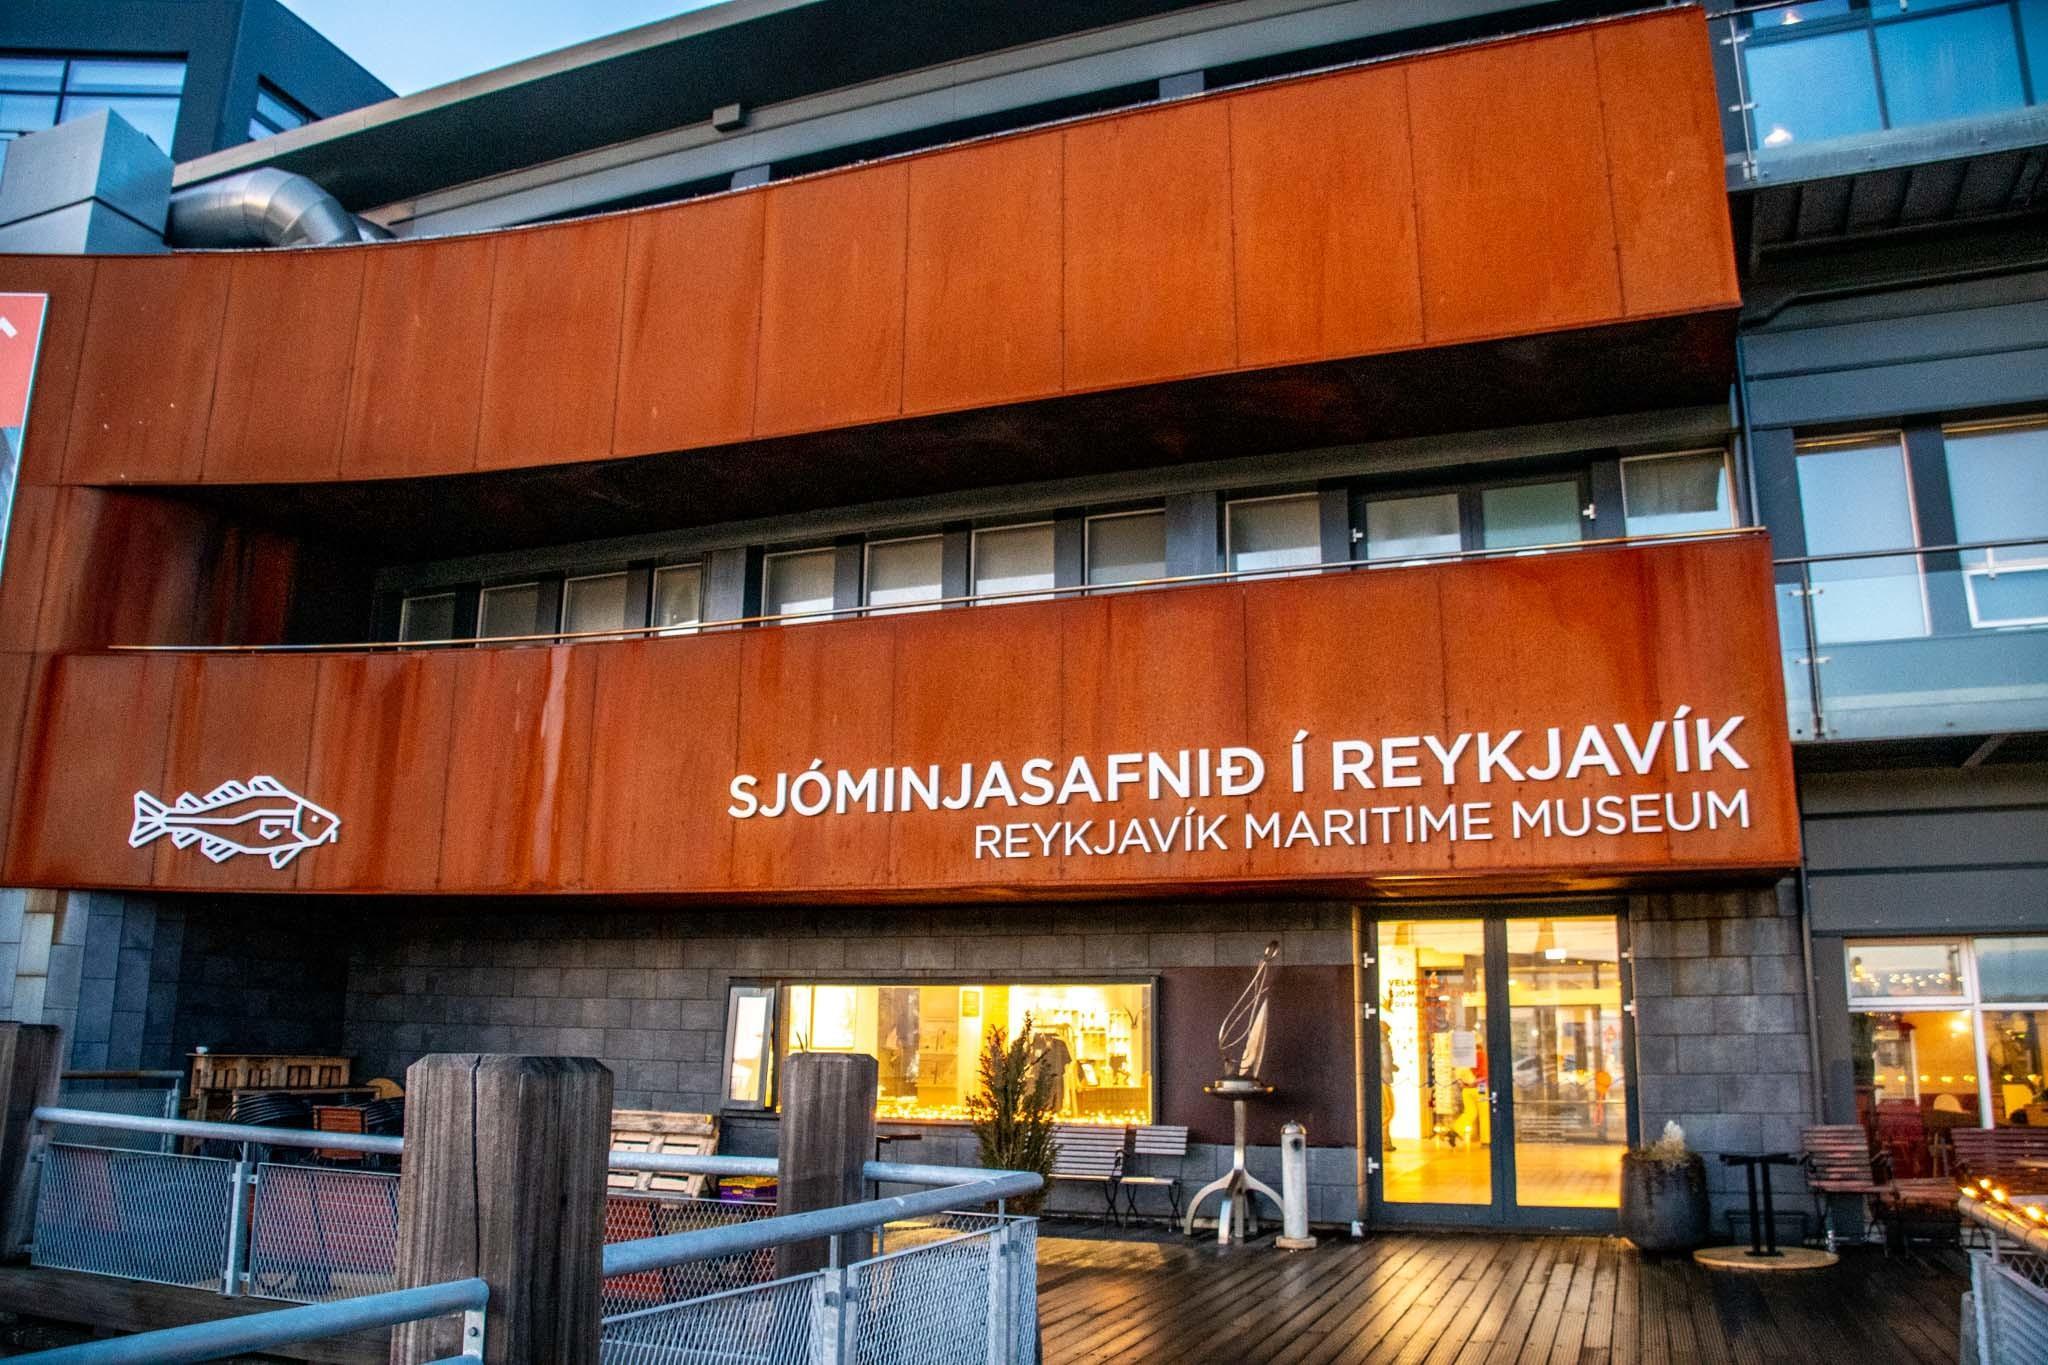 Reykjavik Maritime Museum in the harbor area